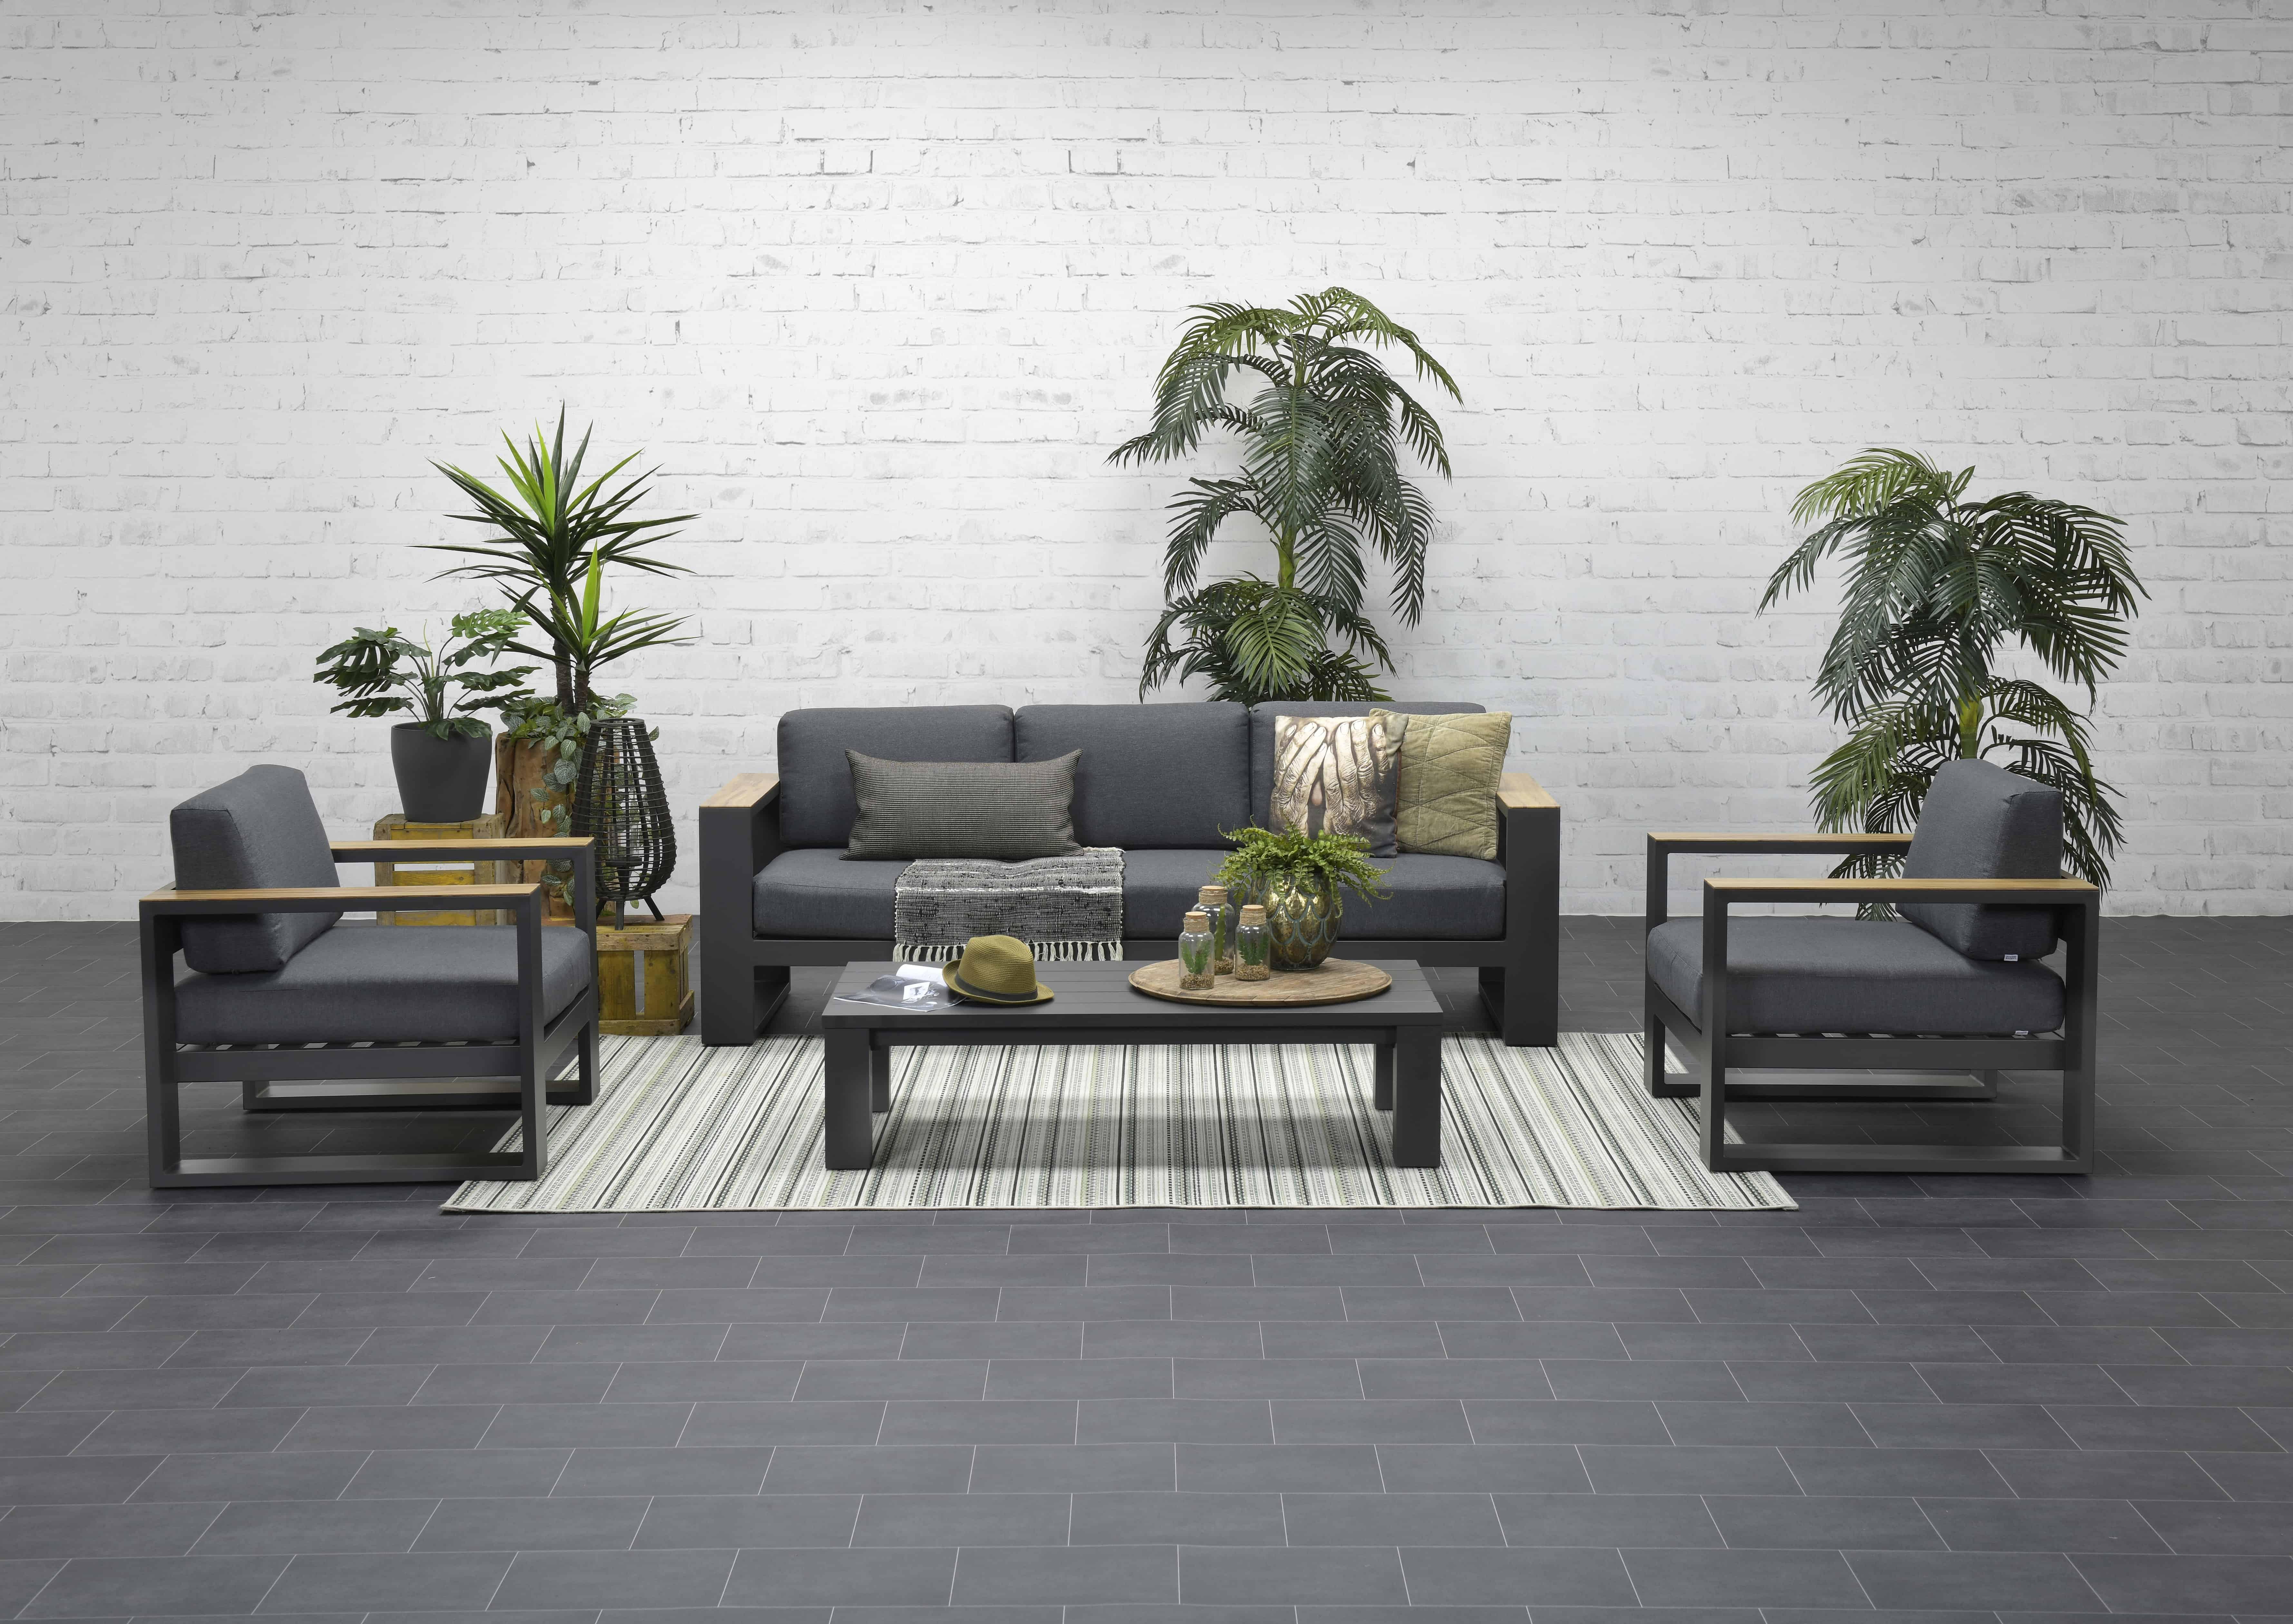 Salamanca Outdoor Sofa Set - Outdoor Furniture For Sale Dublin Ireland